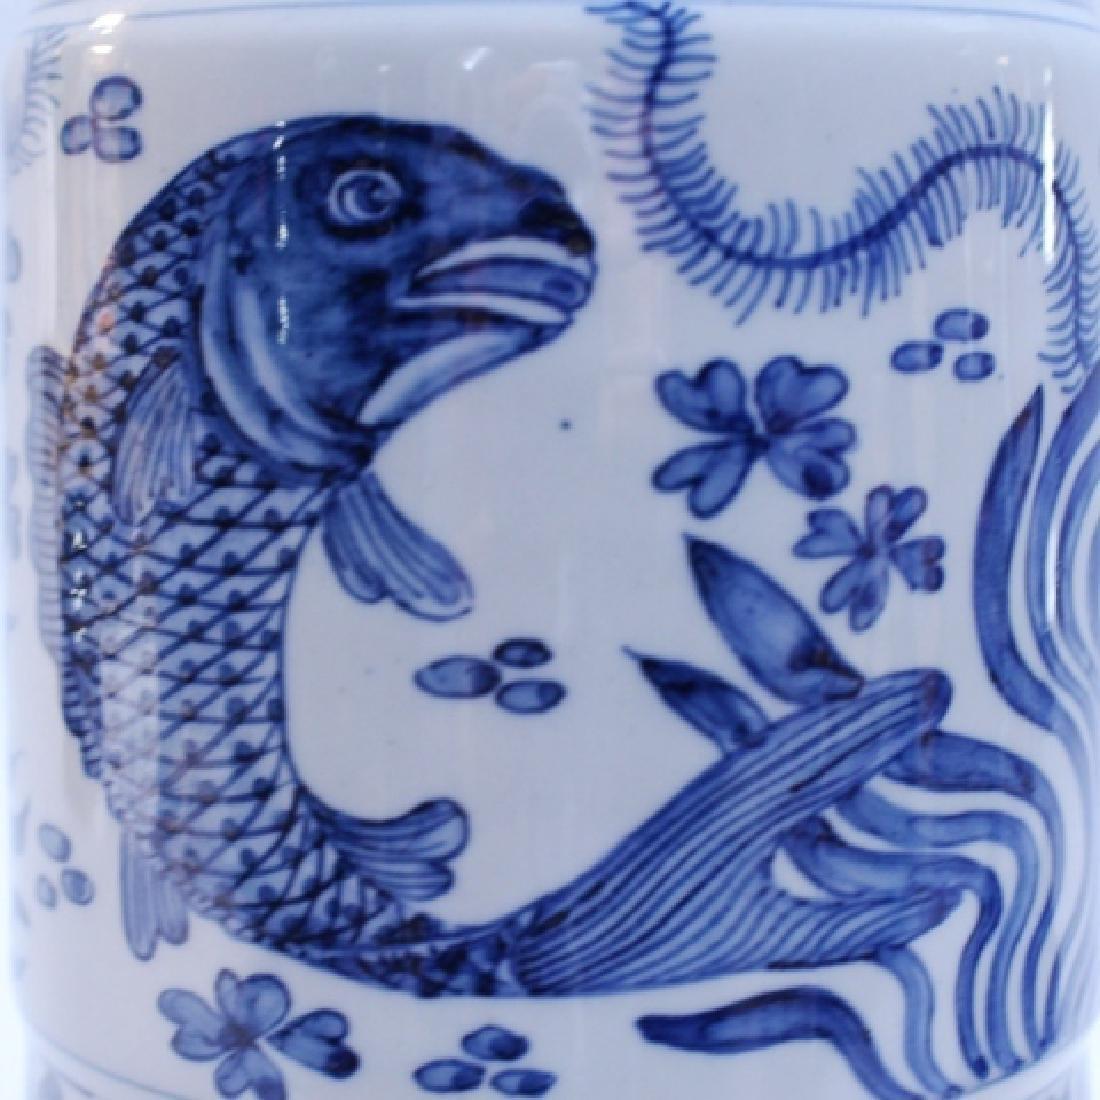 Decorative Blue and White Porcelain Gu Vase - 2